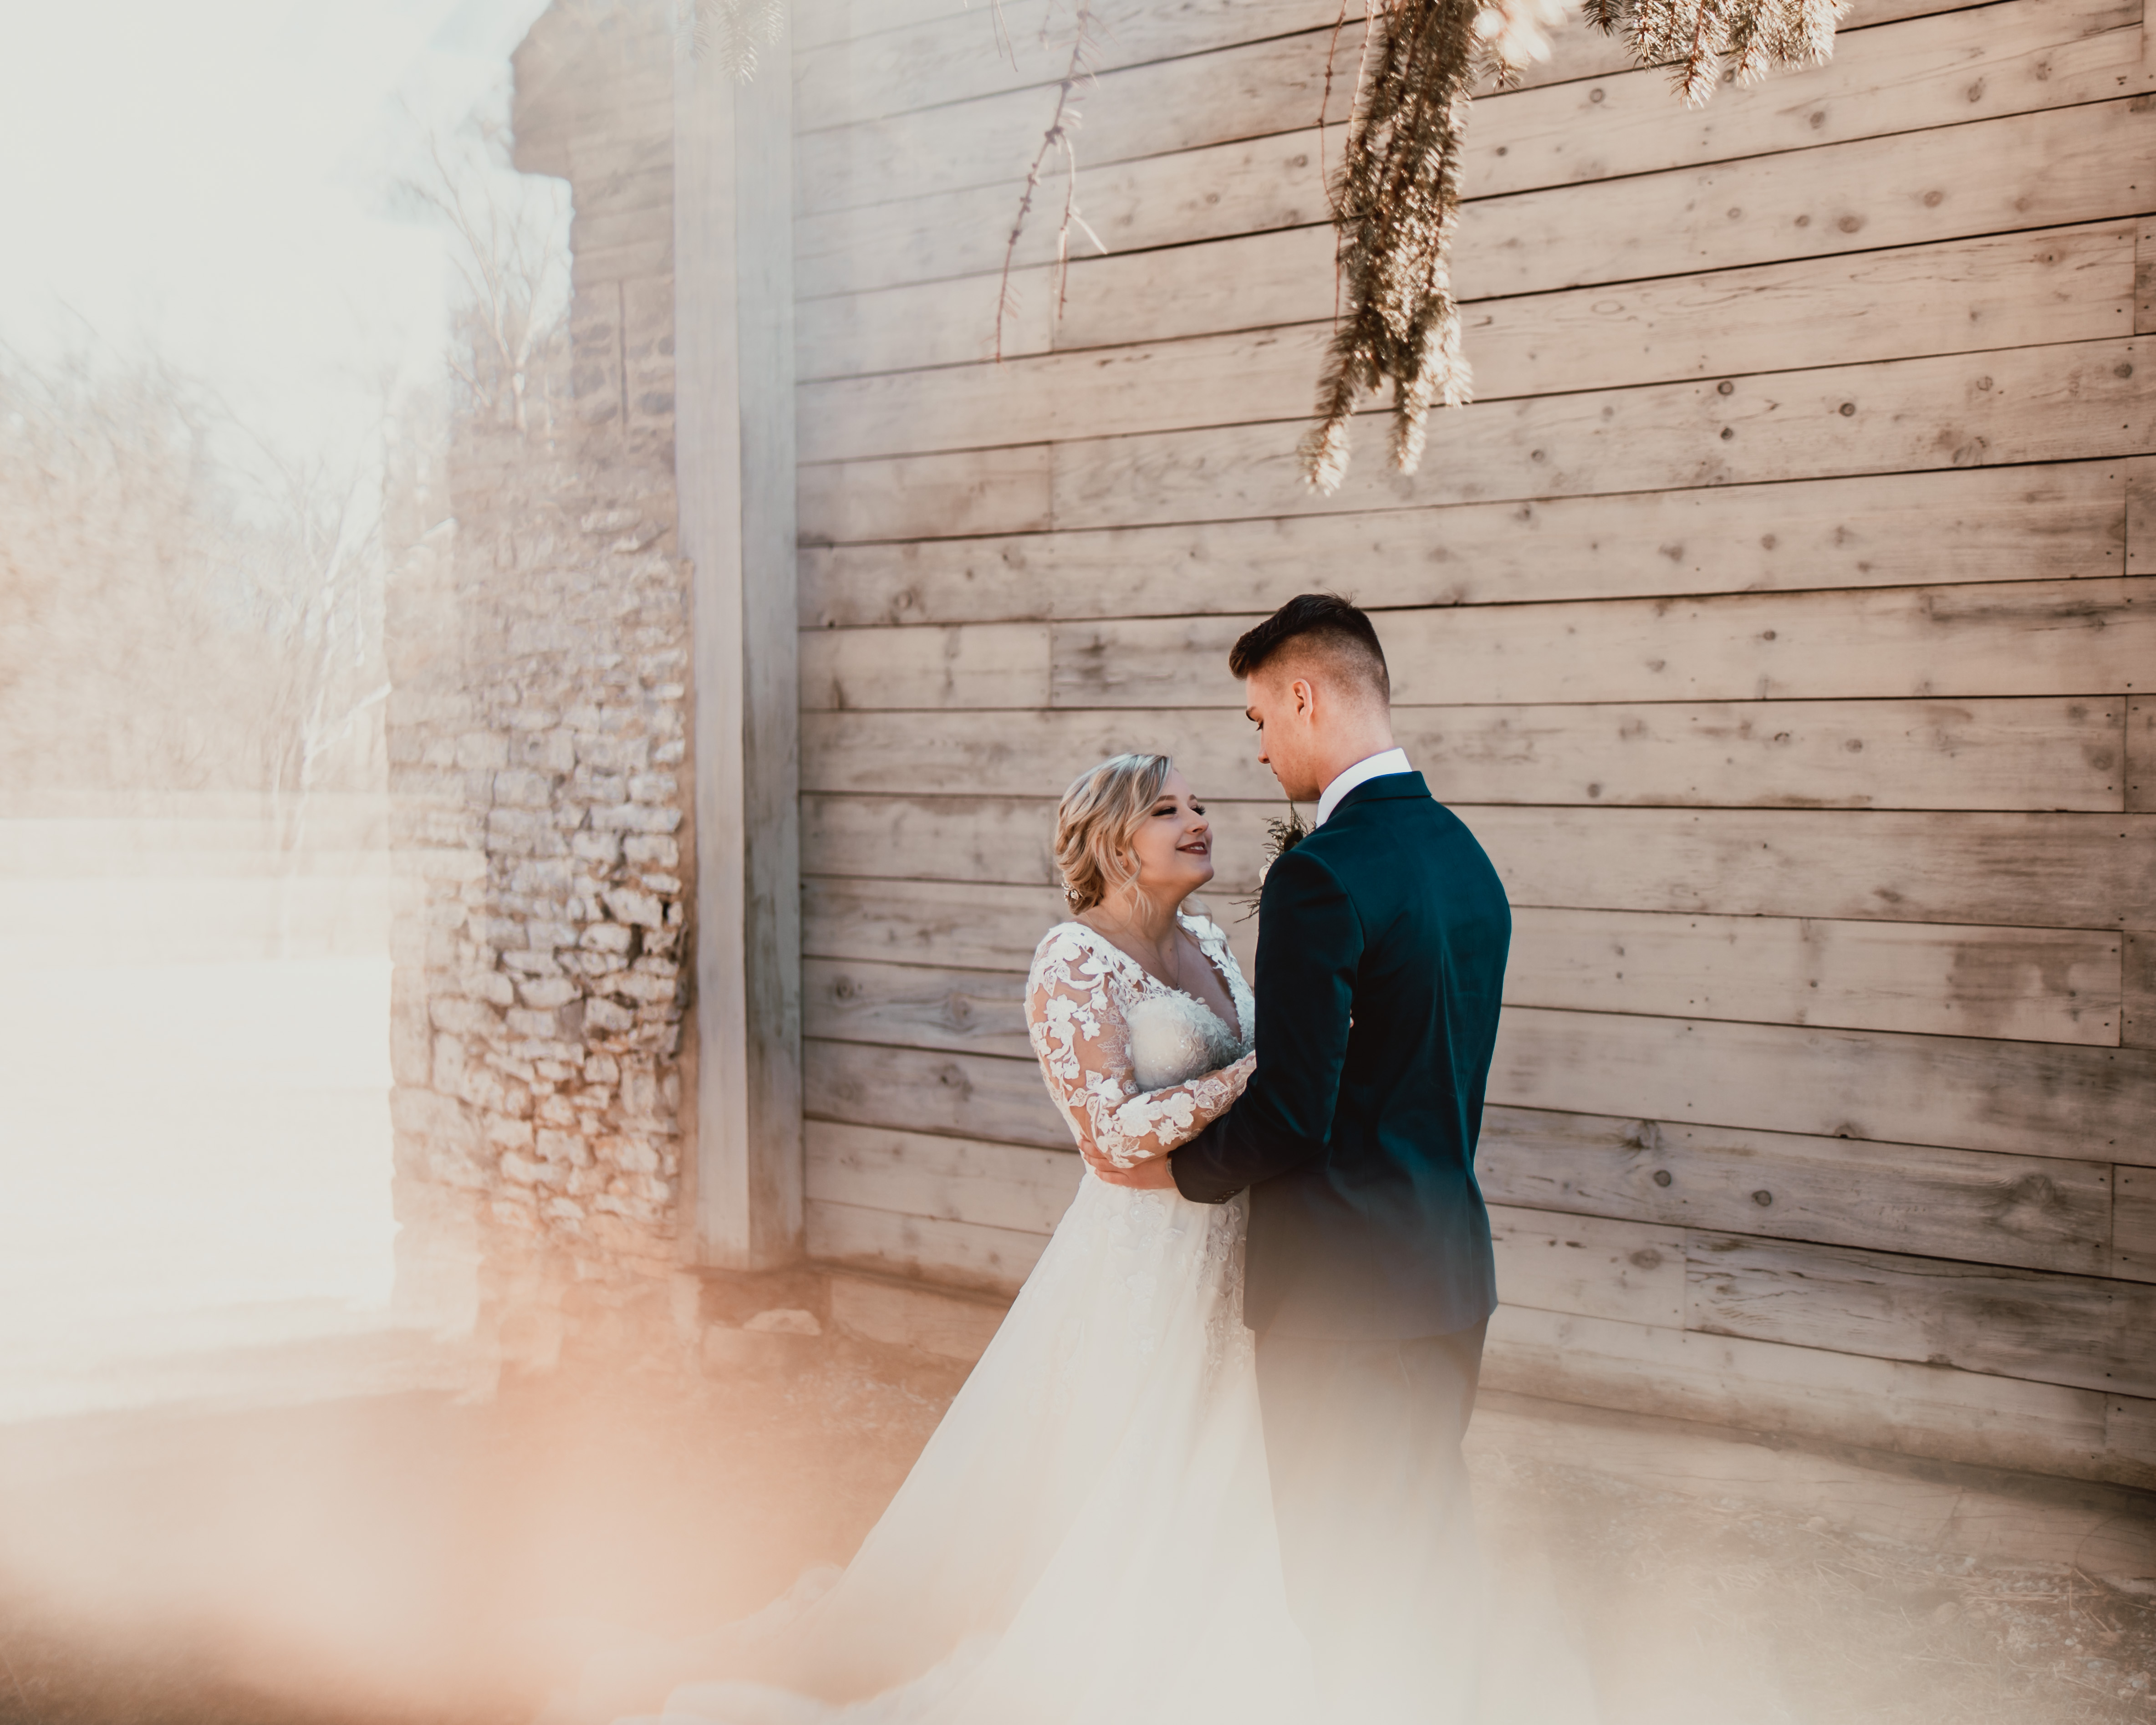 Elizabeth + Parker | Delaware, Ohio | The Barn at Stratford